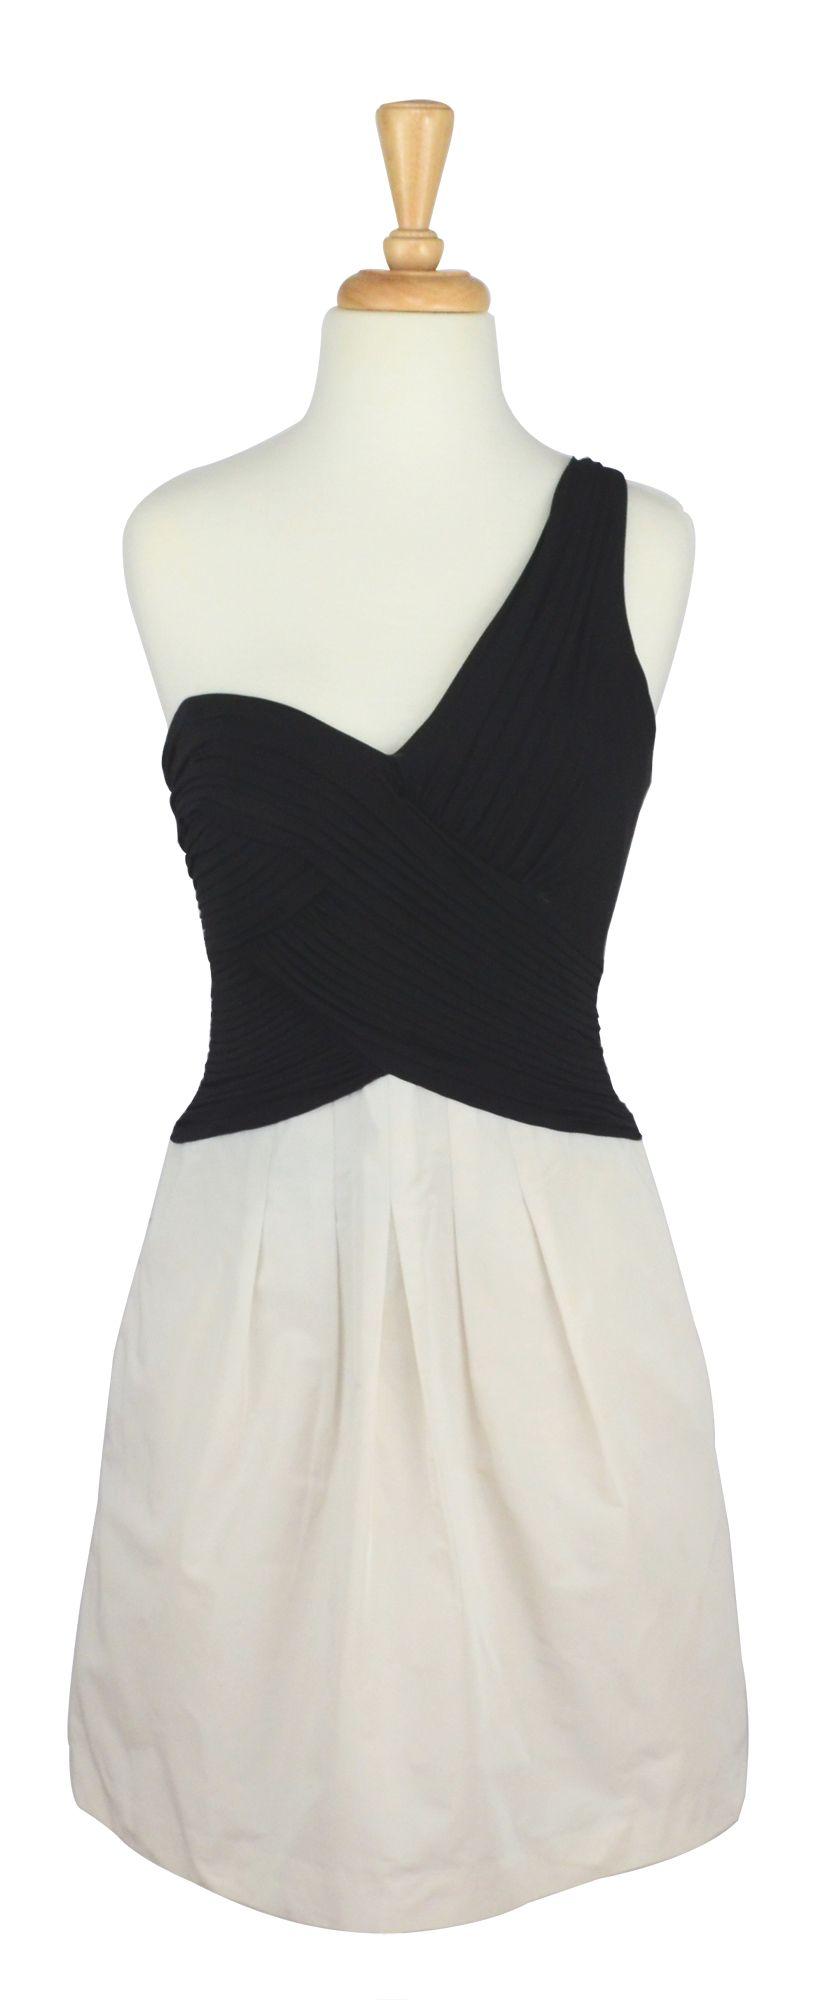 Bcbg max azria black u white asymmetrical dress short vintage prom